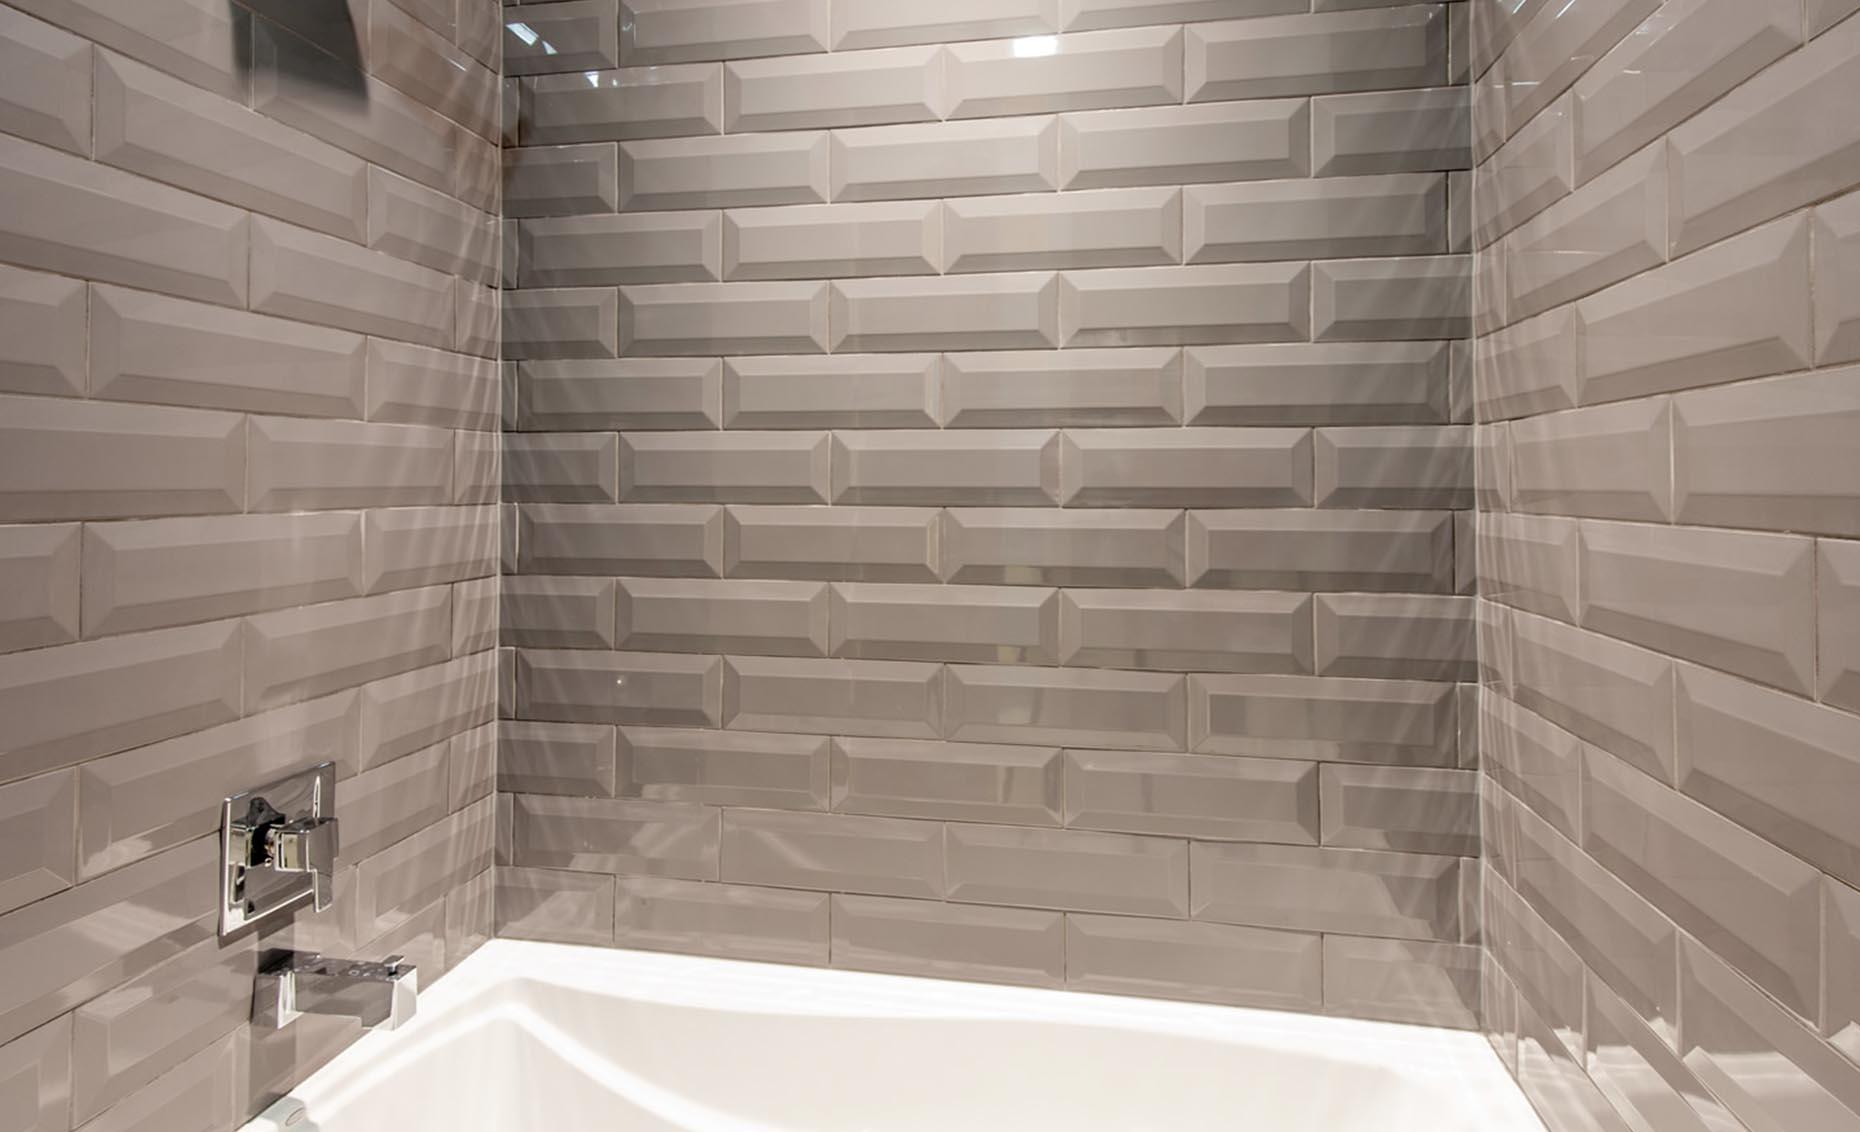 The Corrente Bello House Bath Tub Tile Detail